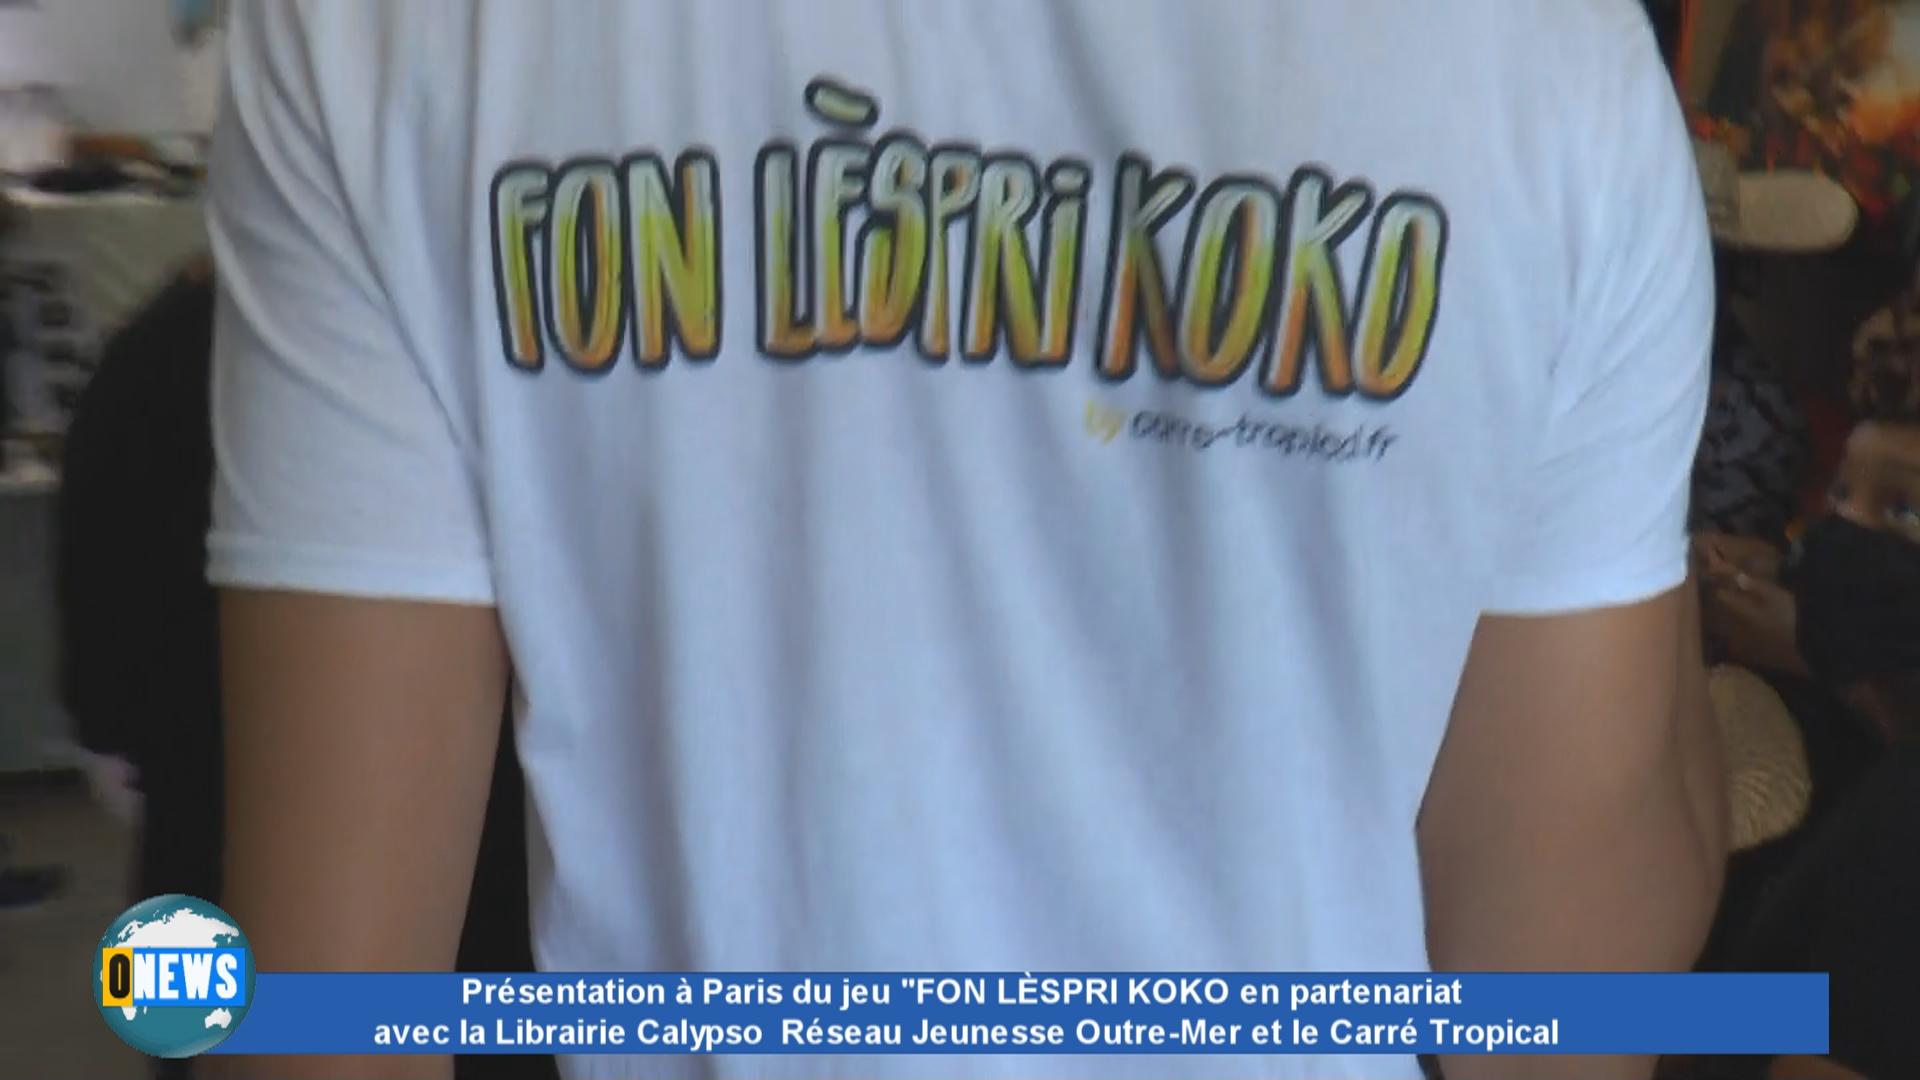 [Vidéo] Onews Hexagone. Présentation à Paris du jeu «FON LÈSPRI KOKO» à la Librairie Calypso